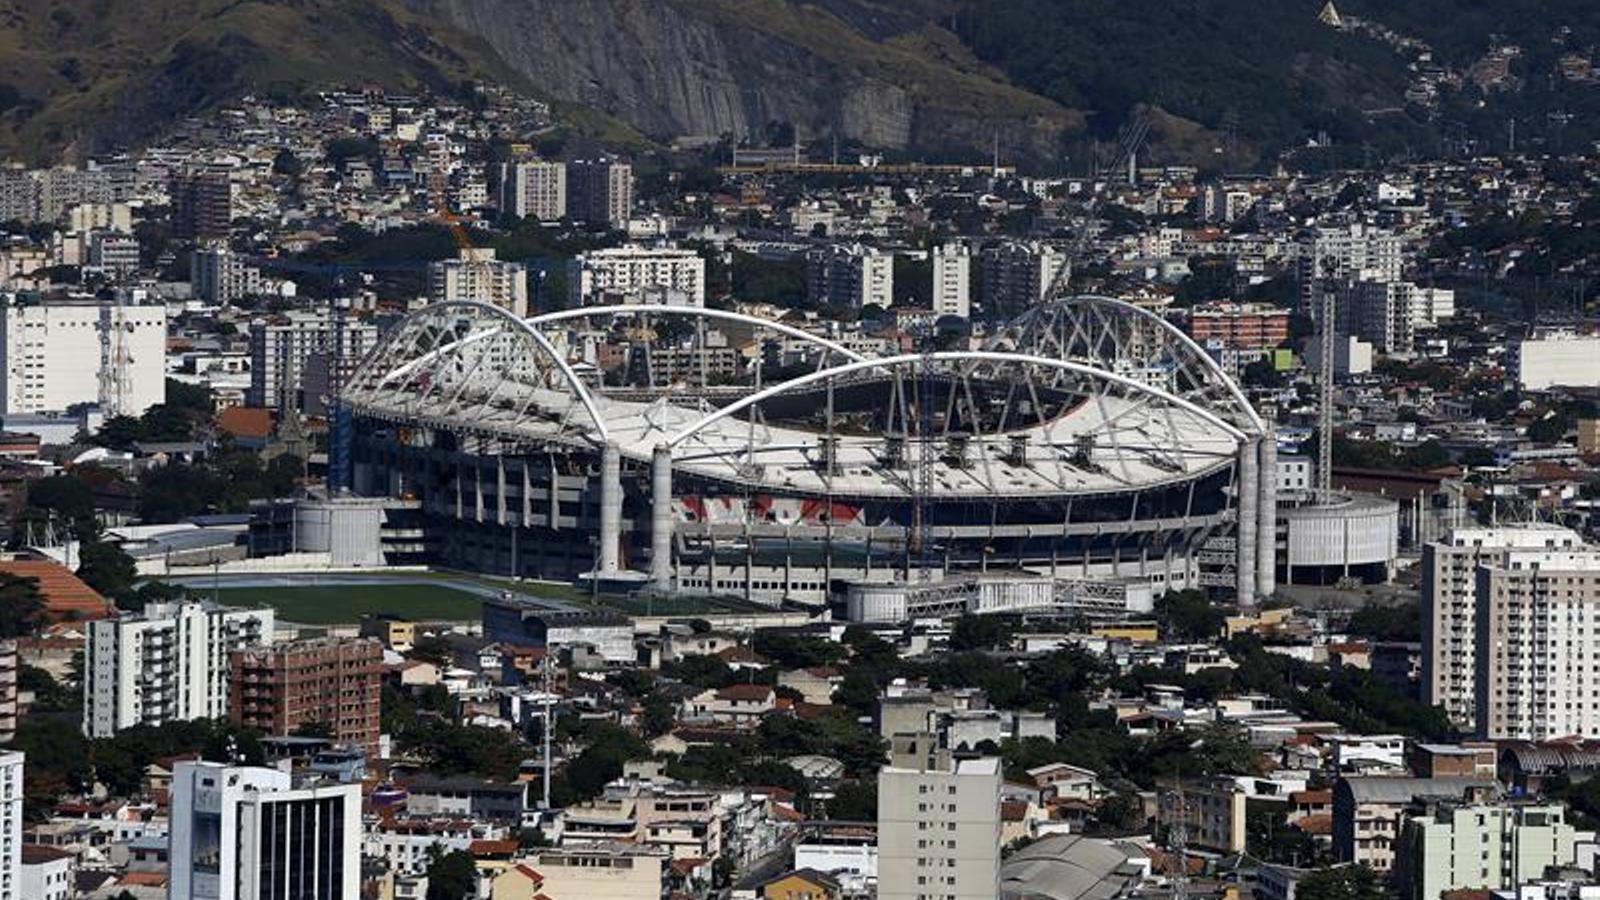 L'estadi Olímpic Joao Havelange